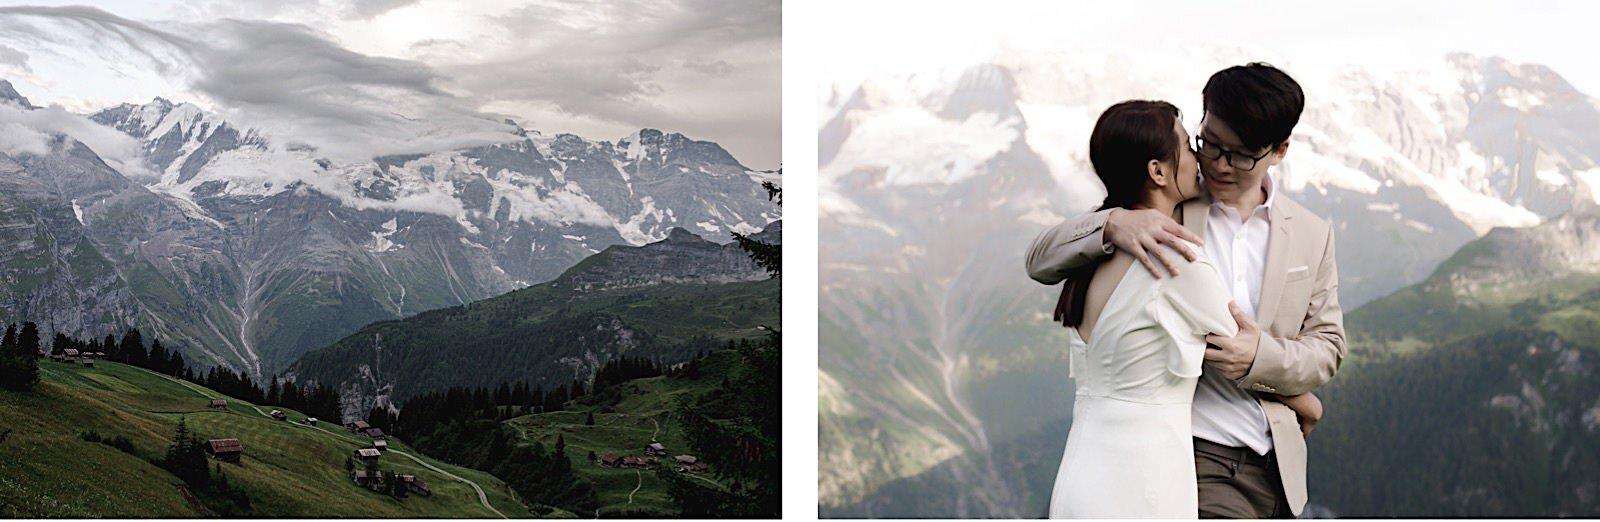 Swiss Alps Photographer Murren Fotomagoria 10.jpg